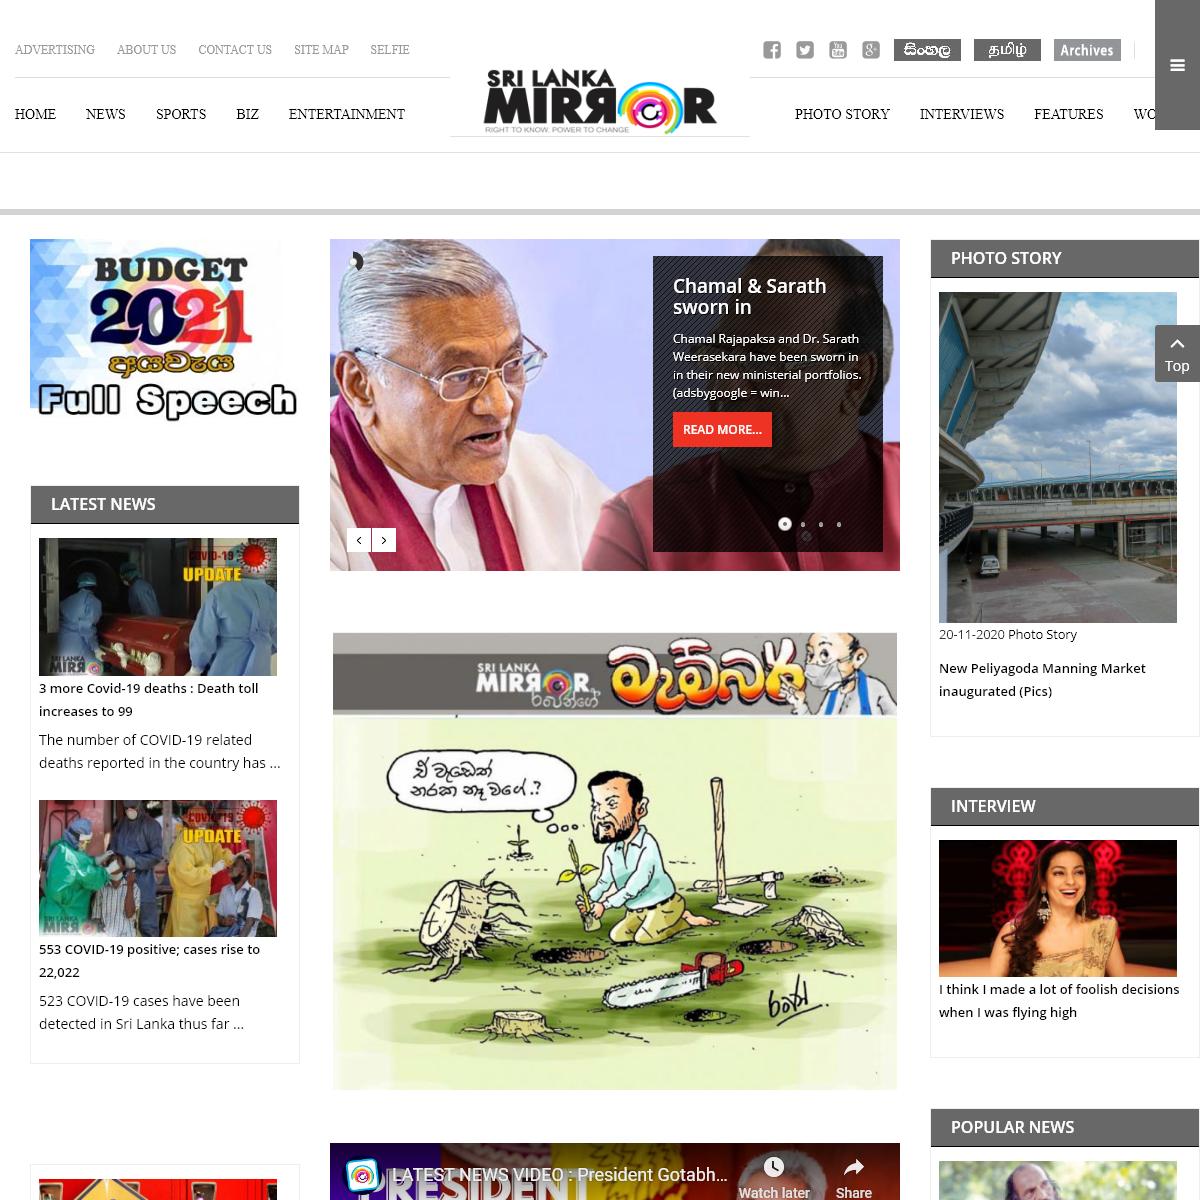 Sri Lanka Mirror - Right to Know. Power to Change